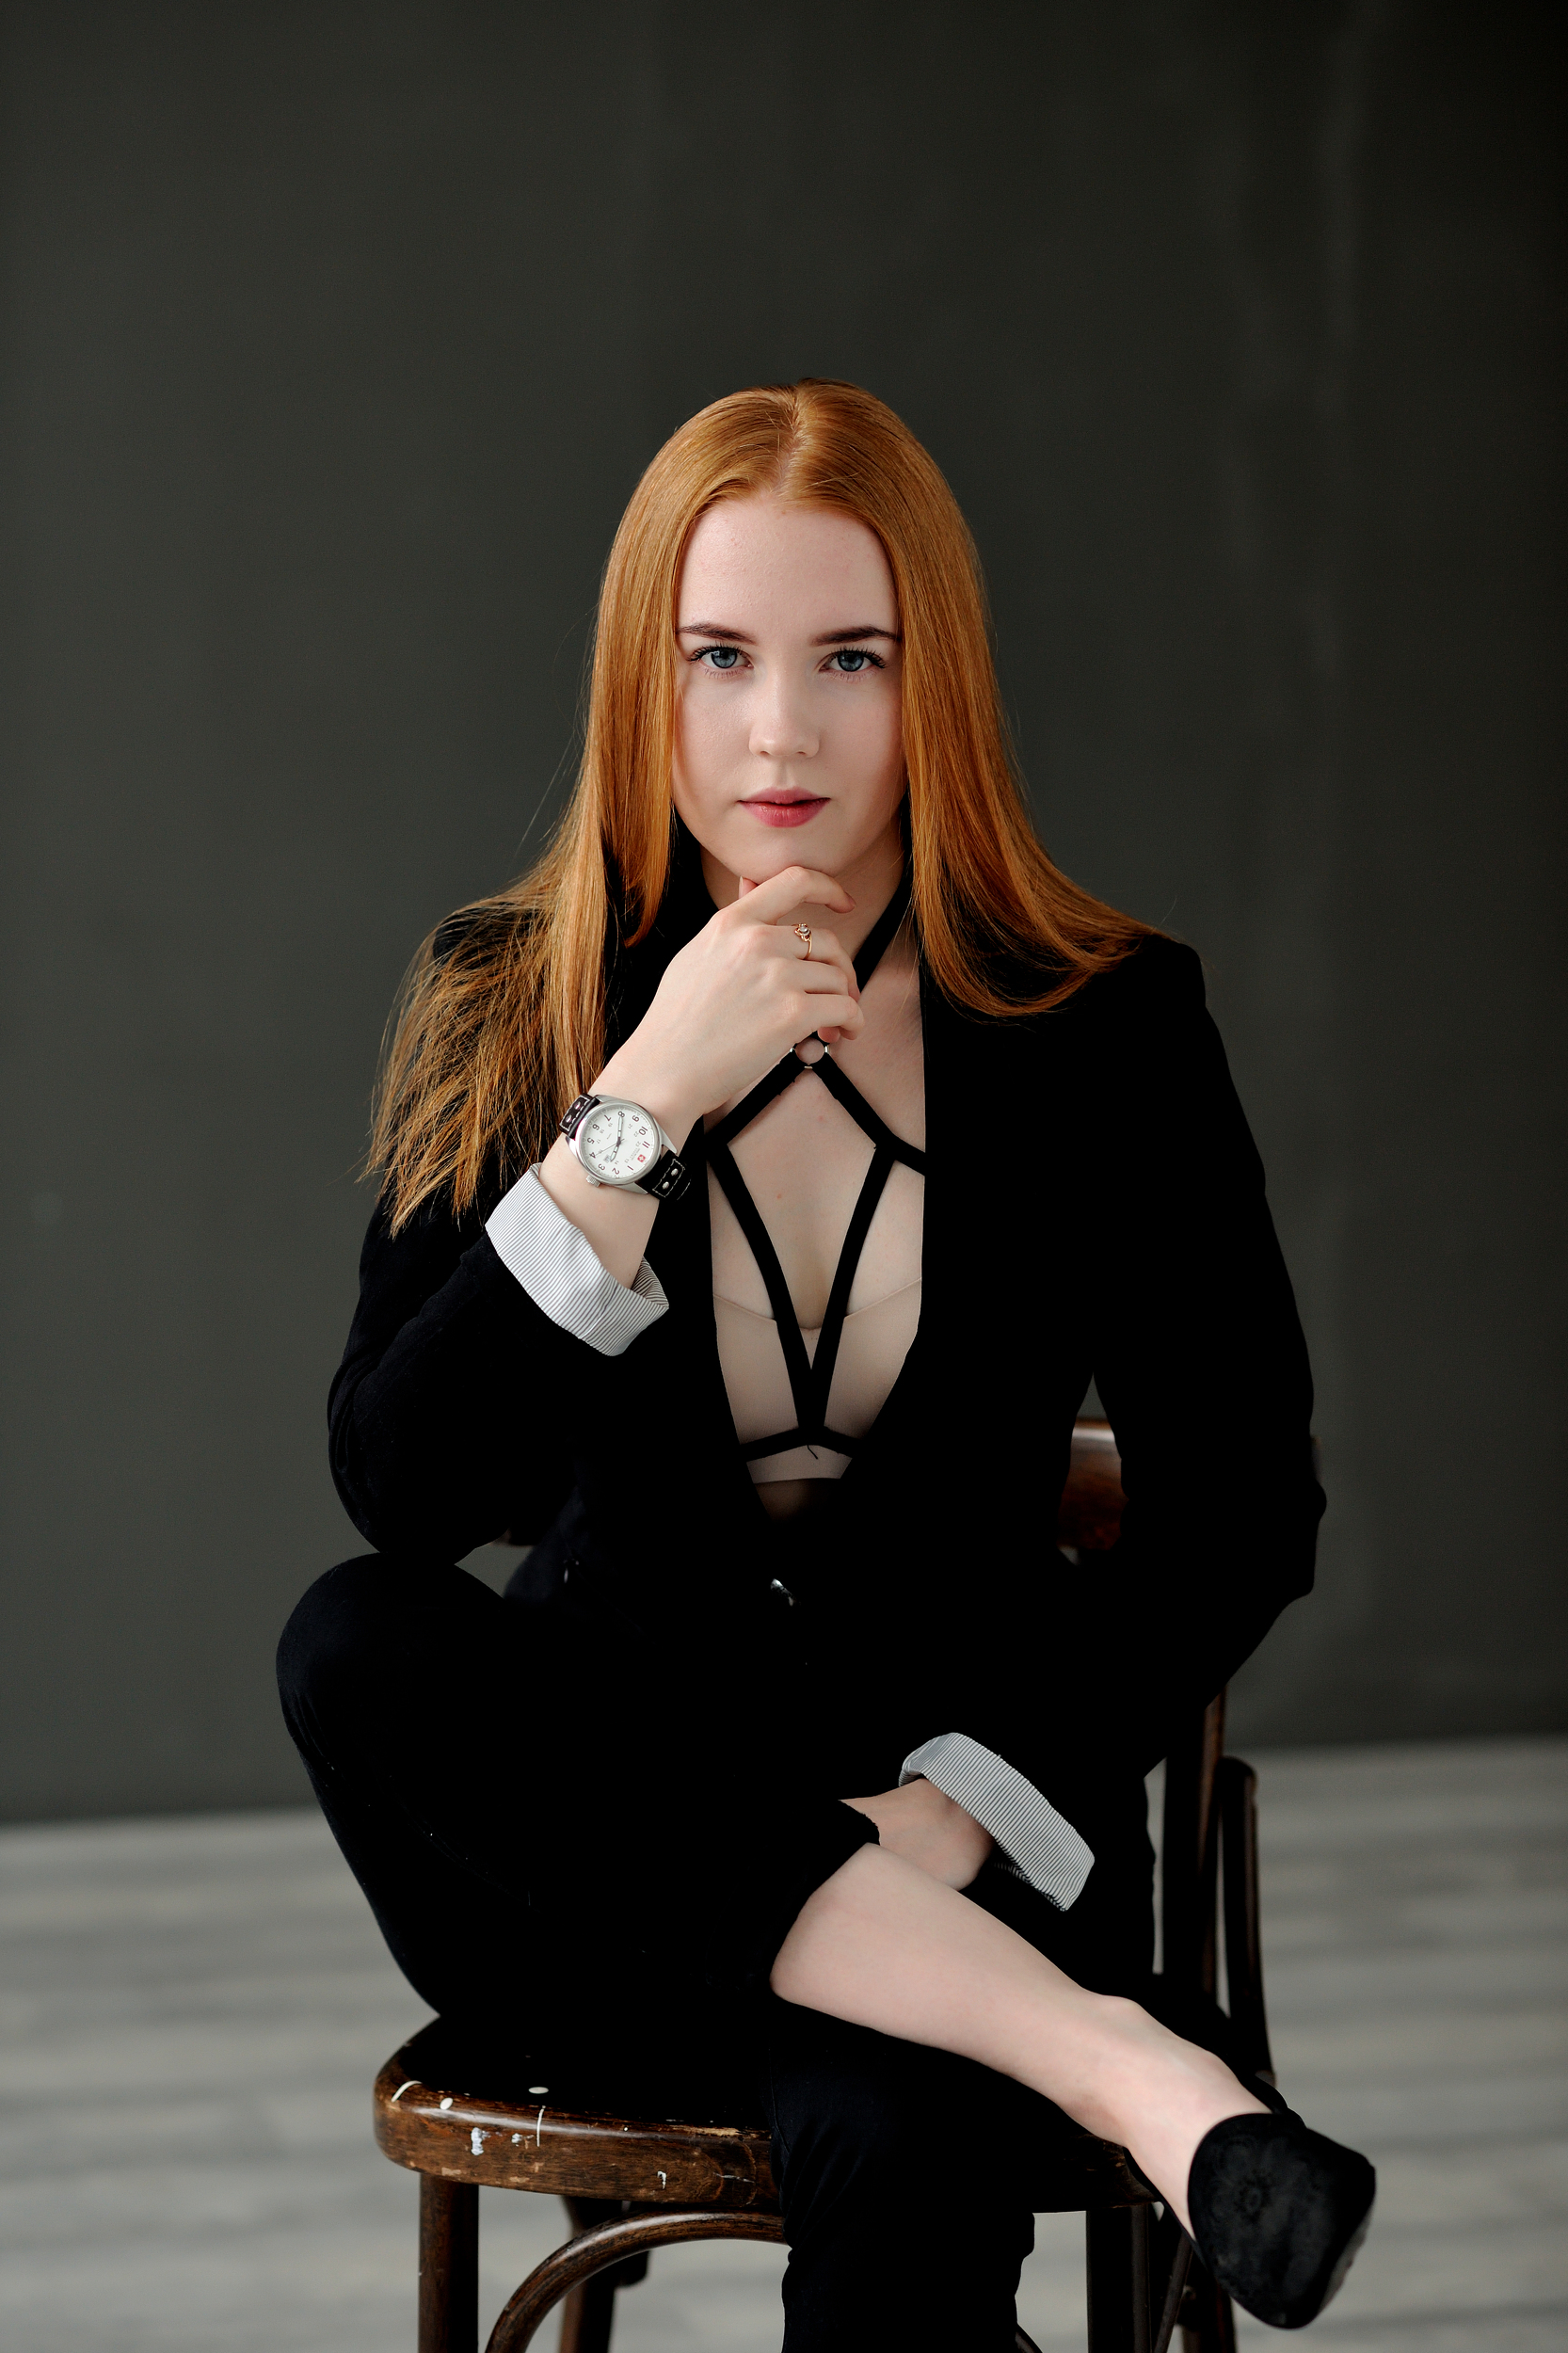 девушка,портрет,студия, Влад Шуман